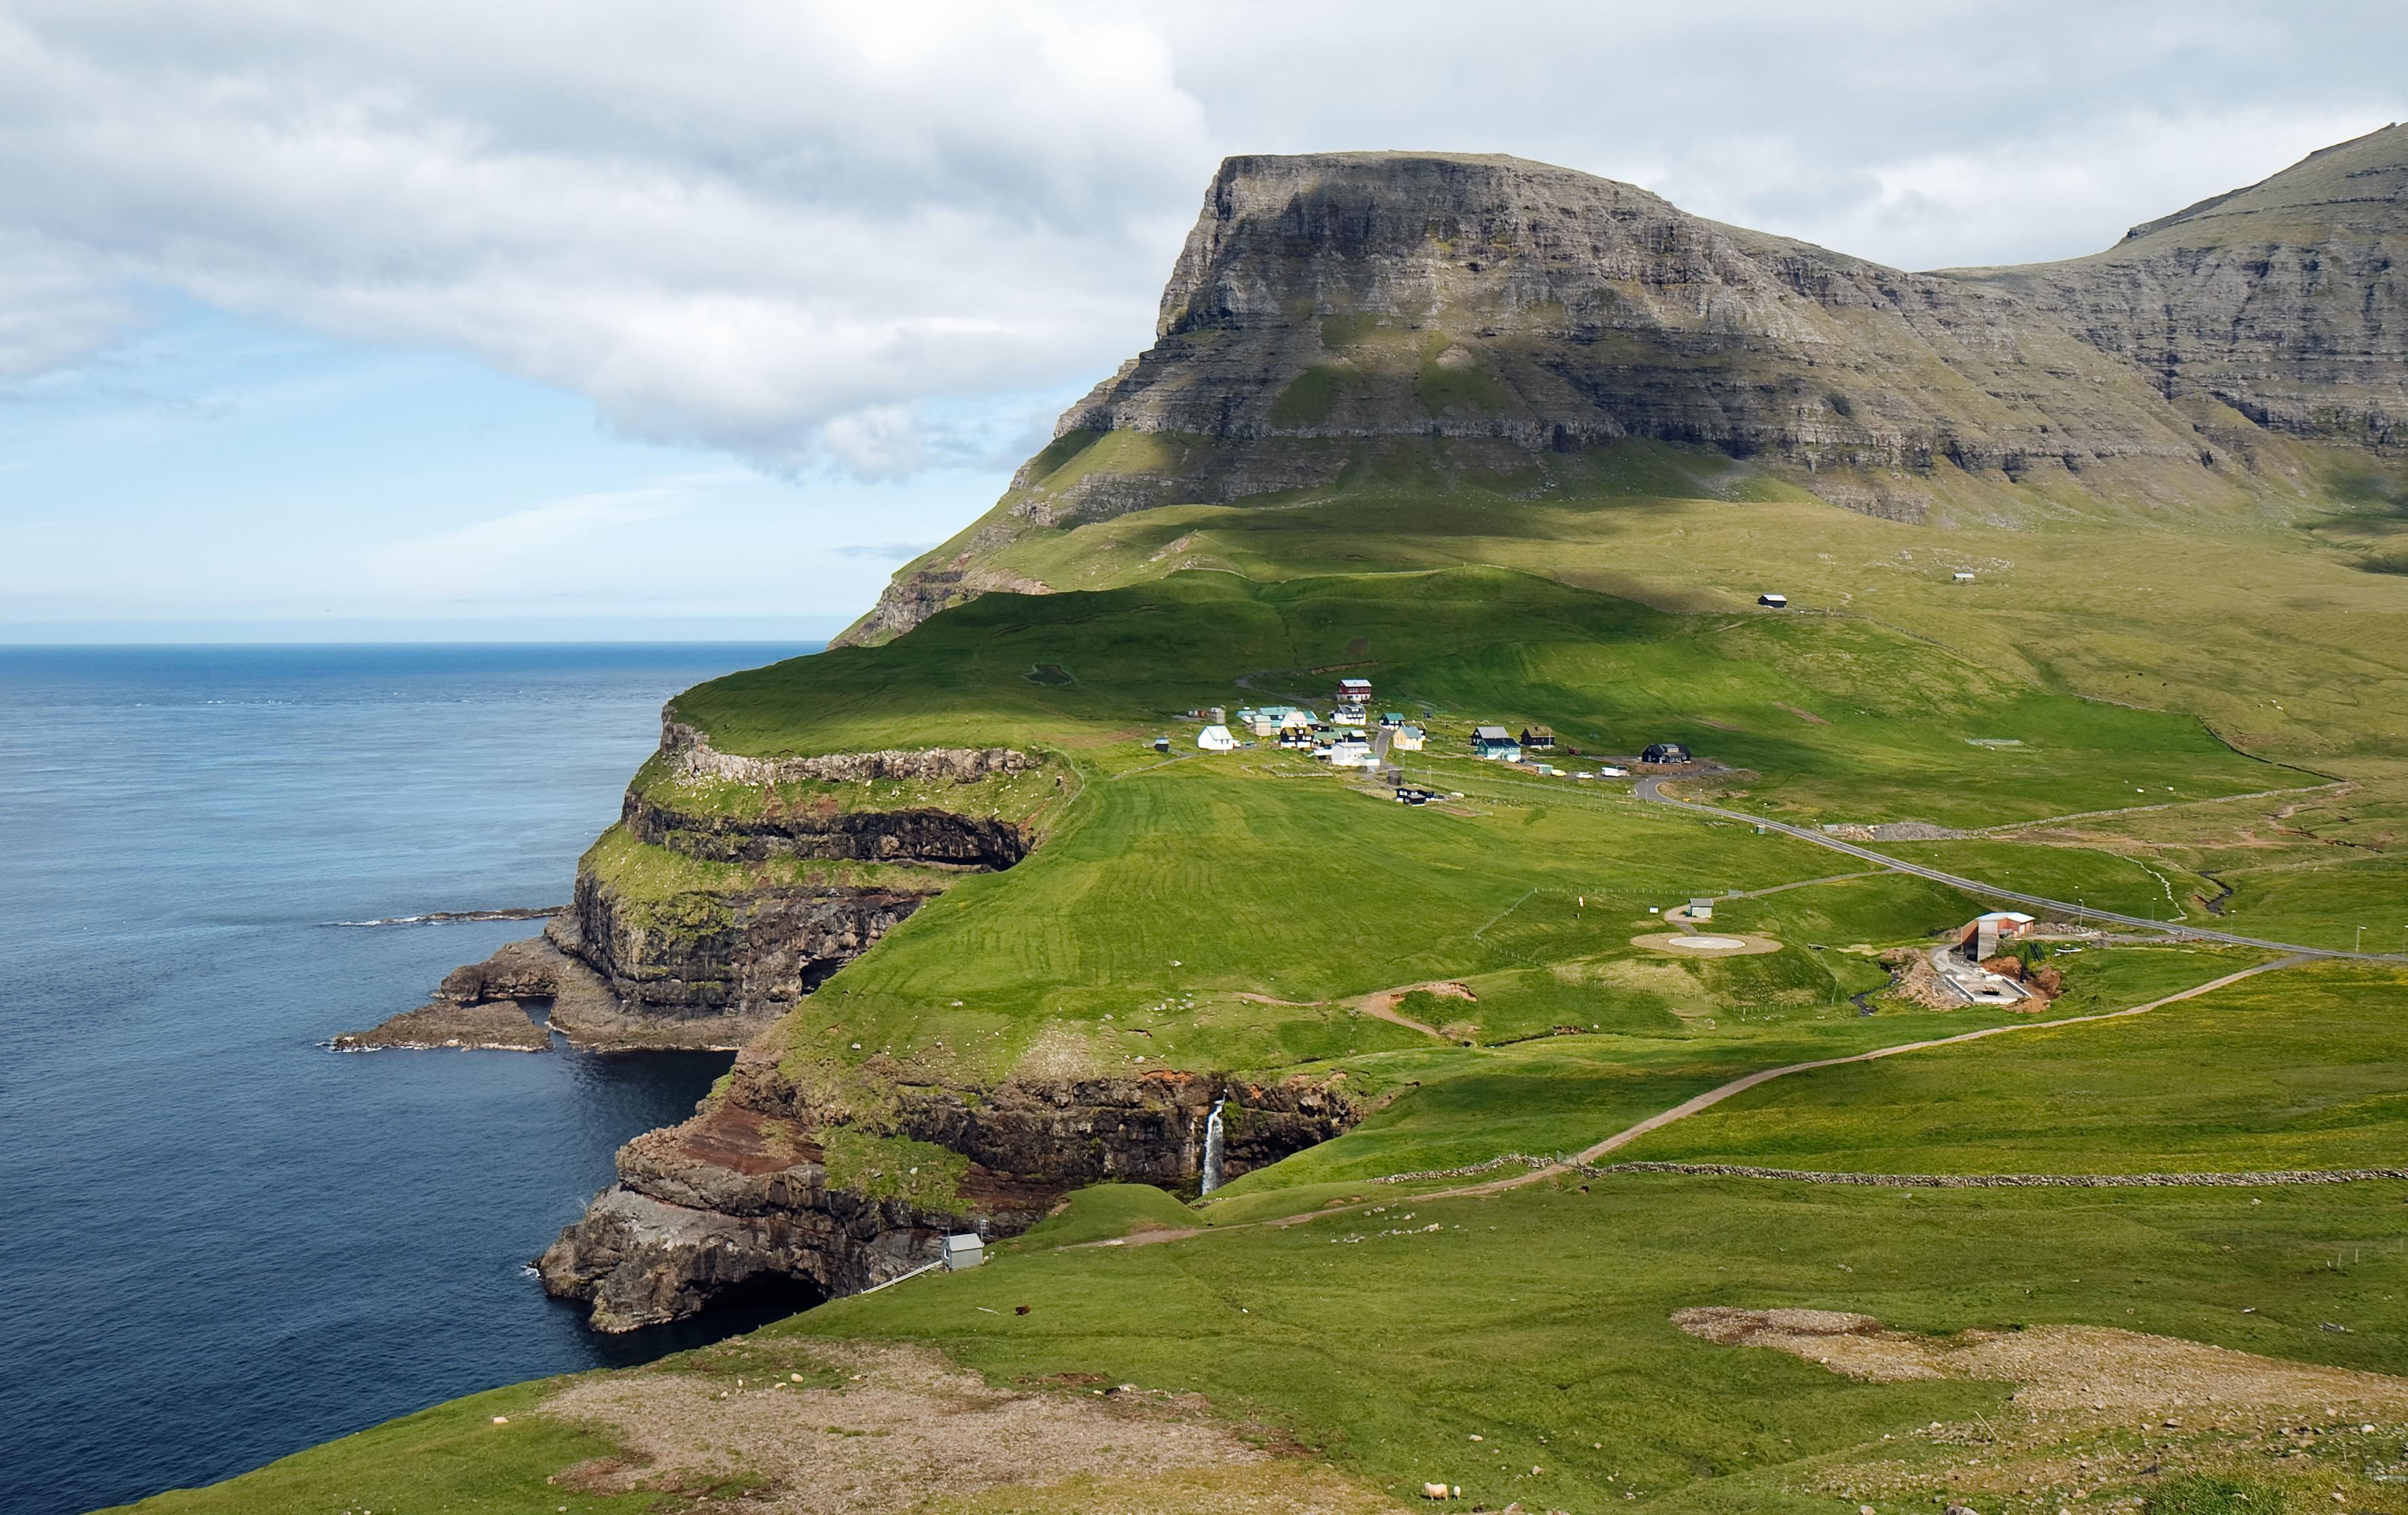 https://upload.wikimedia.org/wikipedia/commons/b/b3/G%C3%A1sadalur_-_Faroe_Islands.jpg